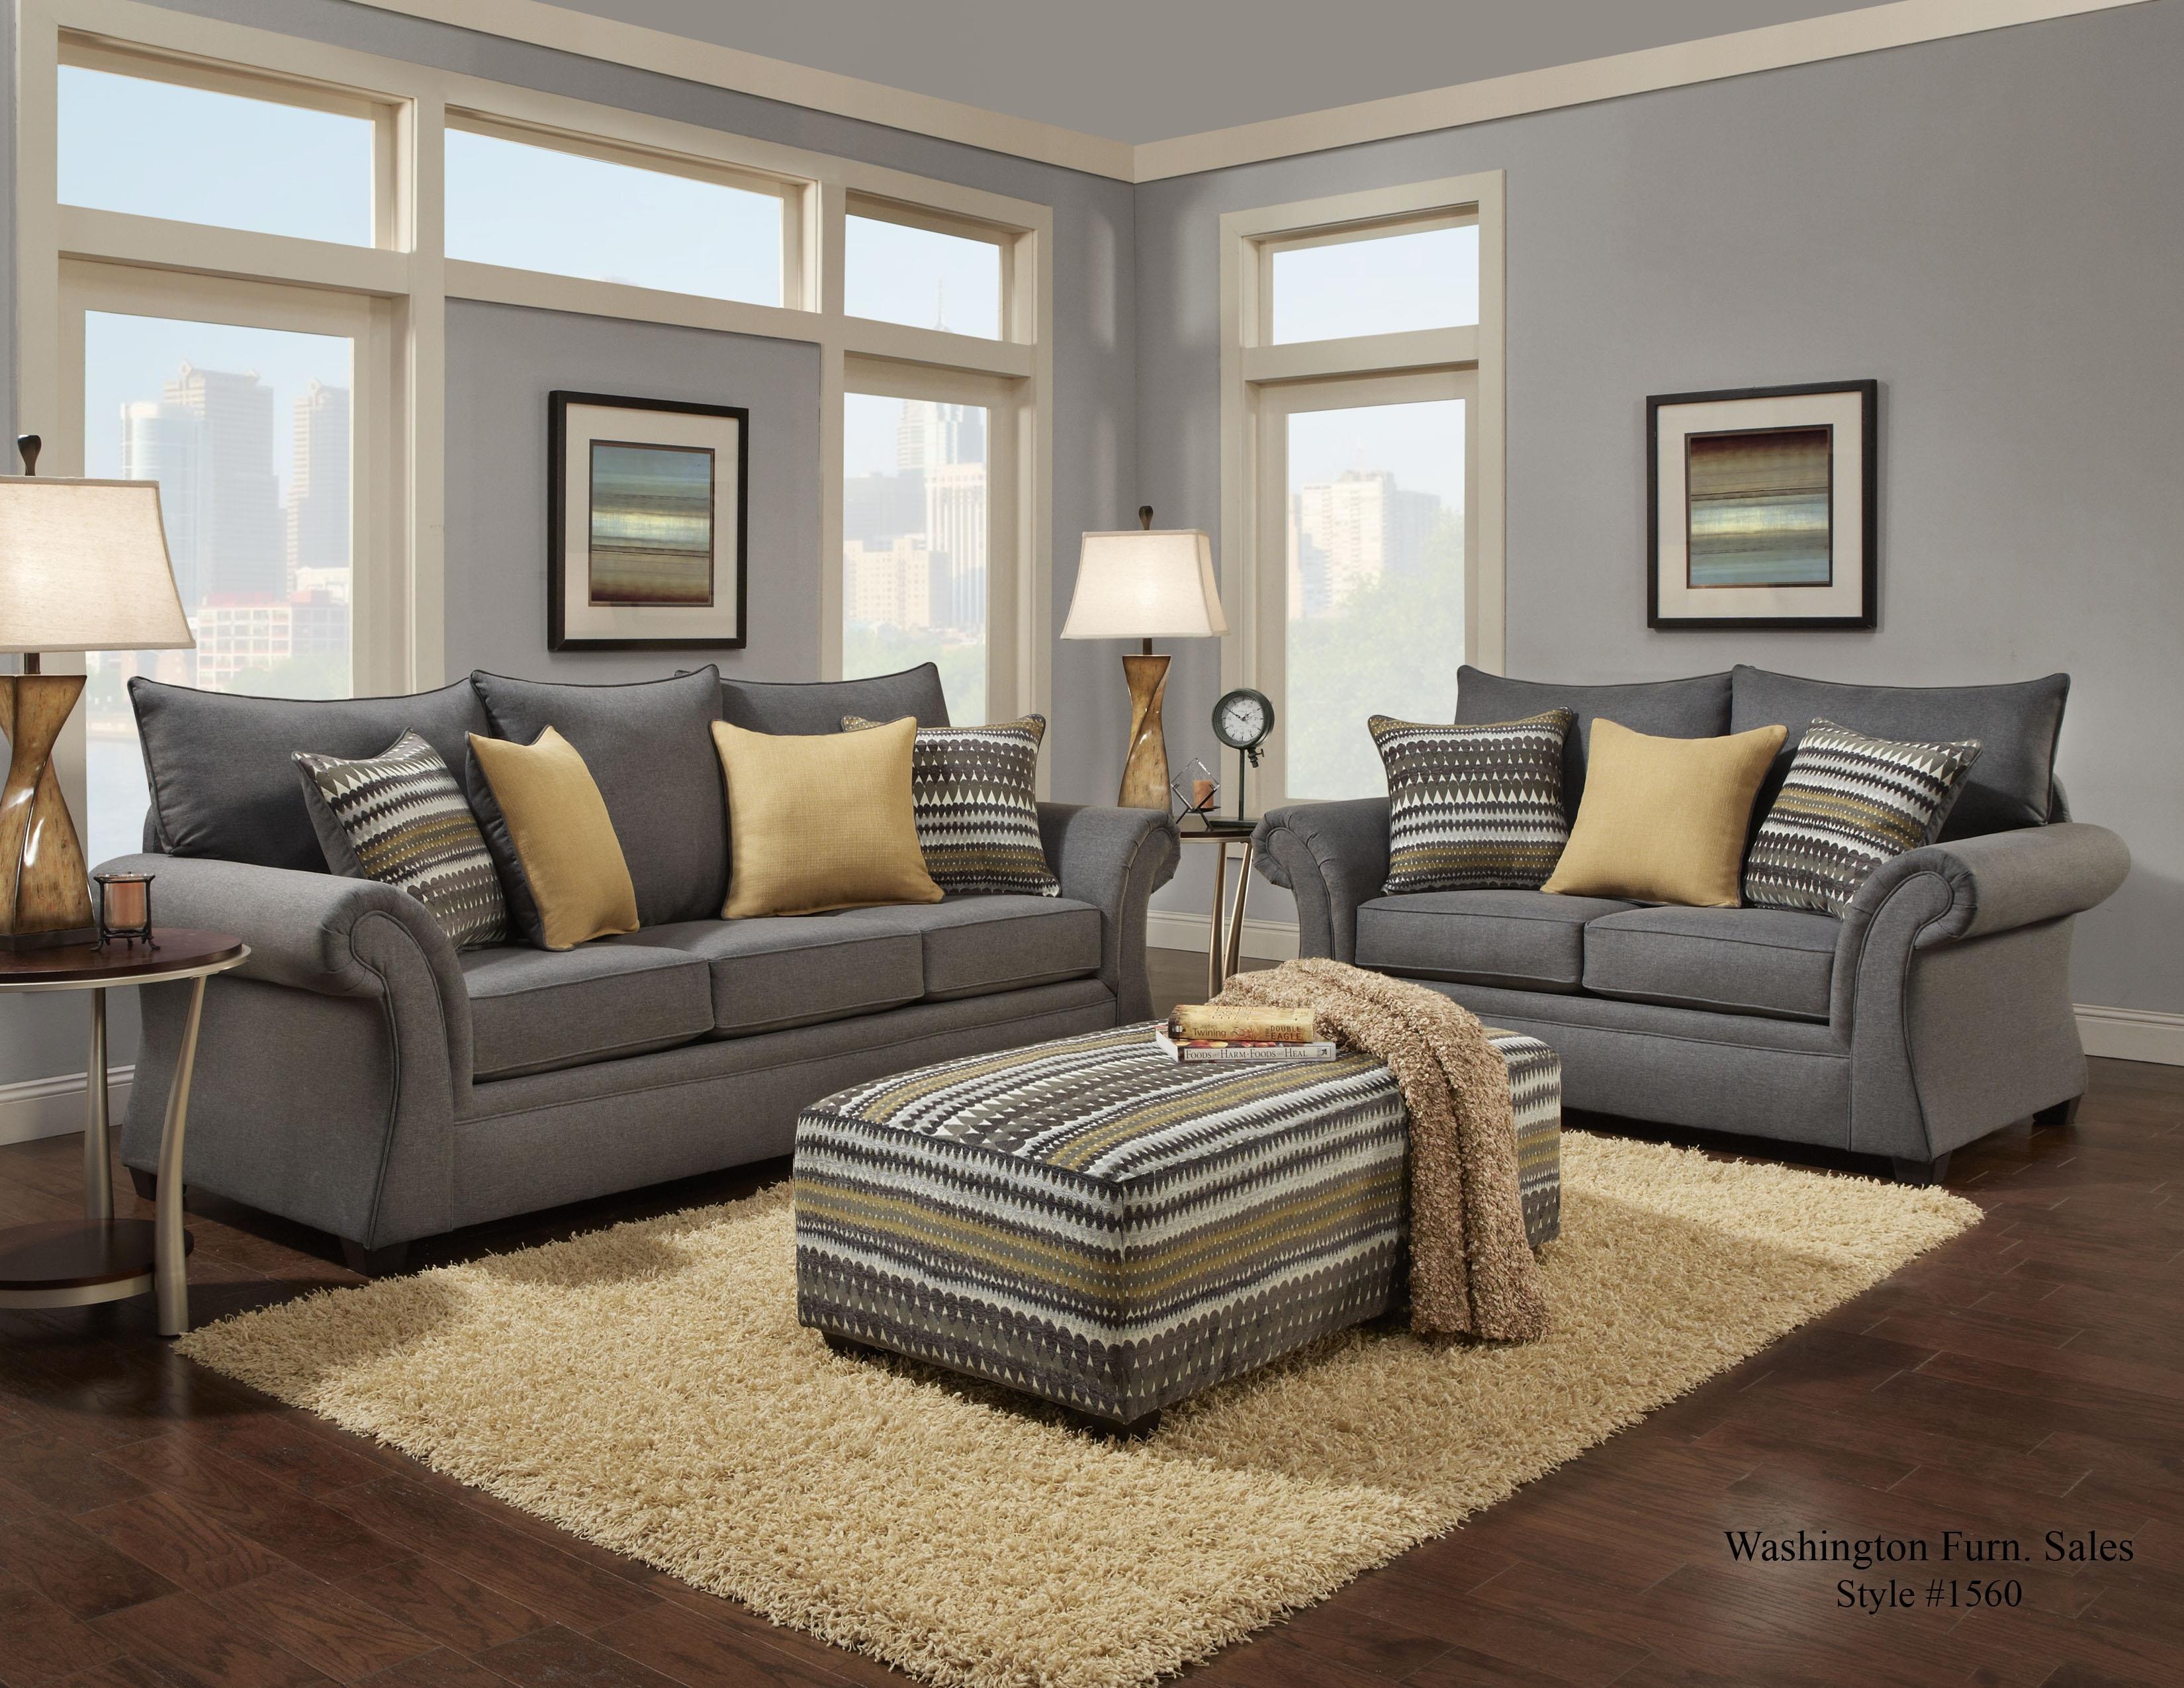 Washington Furniture 1560 1563 751 Transitional Sofa with  : products2Fwashingtonfurniture2Fcolor2F156020washington1562 75020jitterbug20gray b2 from www.elpasohouseholdfurniture.com size 3300 x 2550 jpeg 932kB